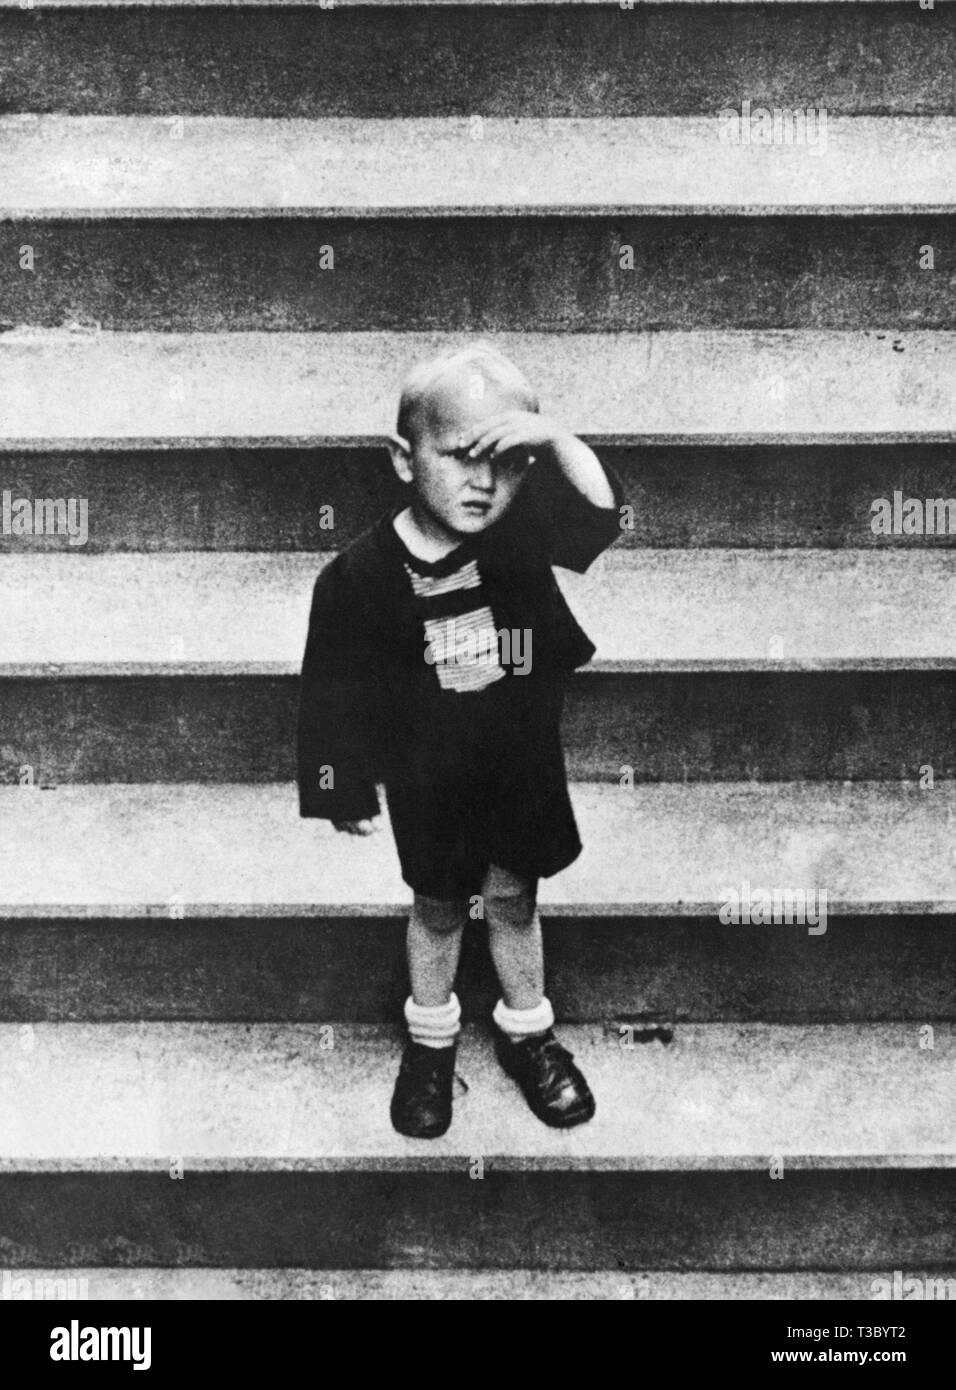 little boy, 1930-1940 - Stock Image